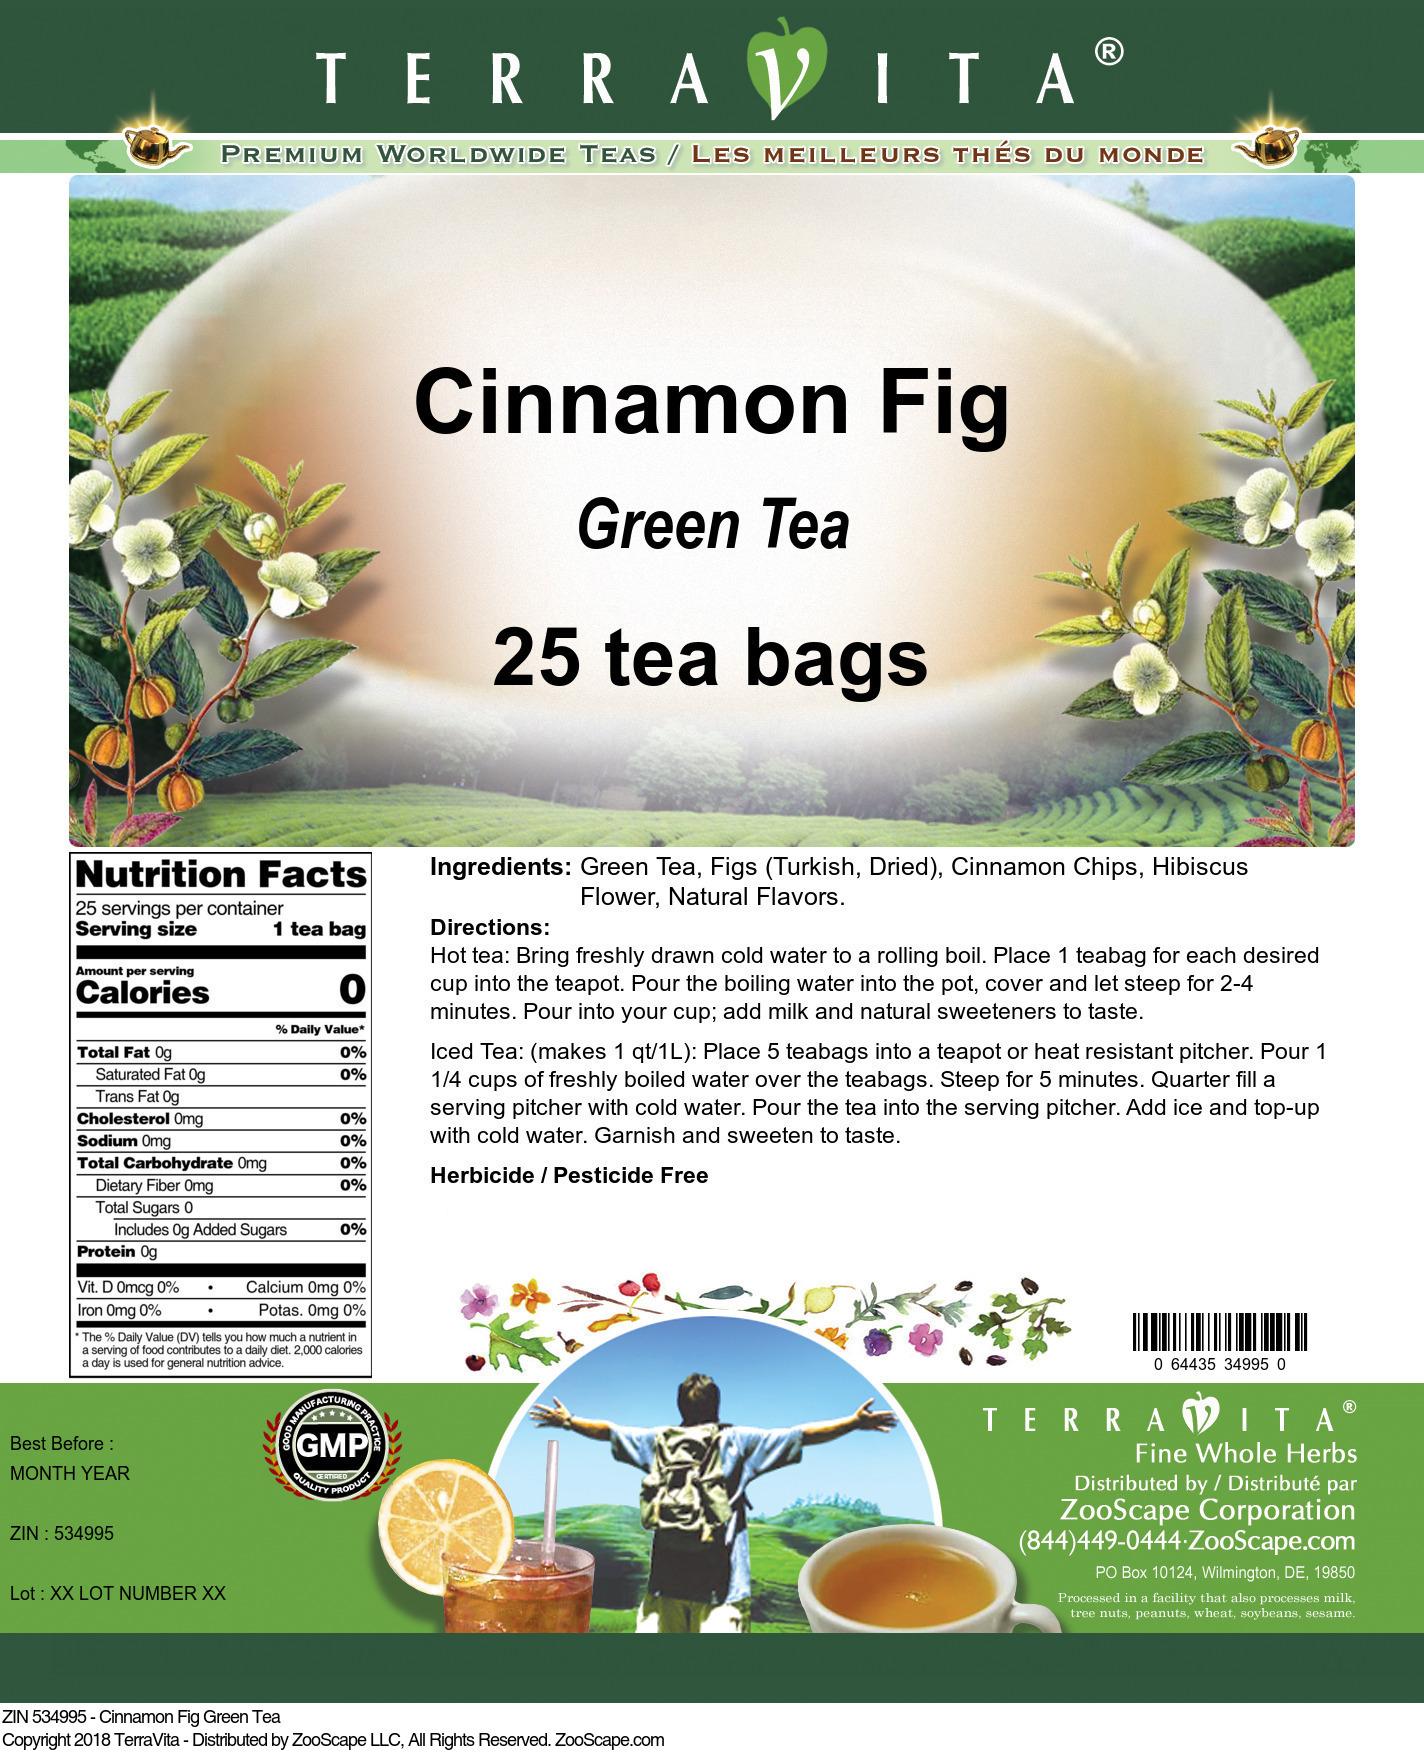 Cinnamon Fig Green Tea